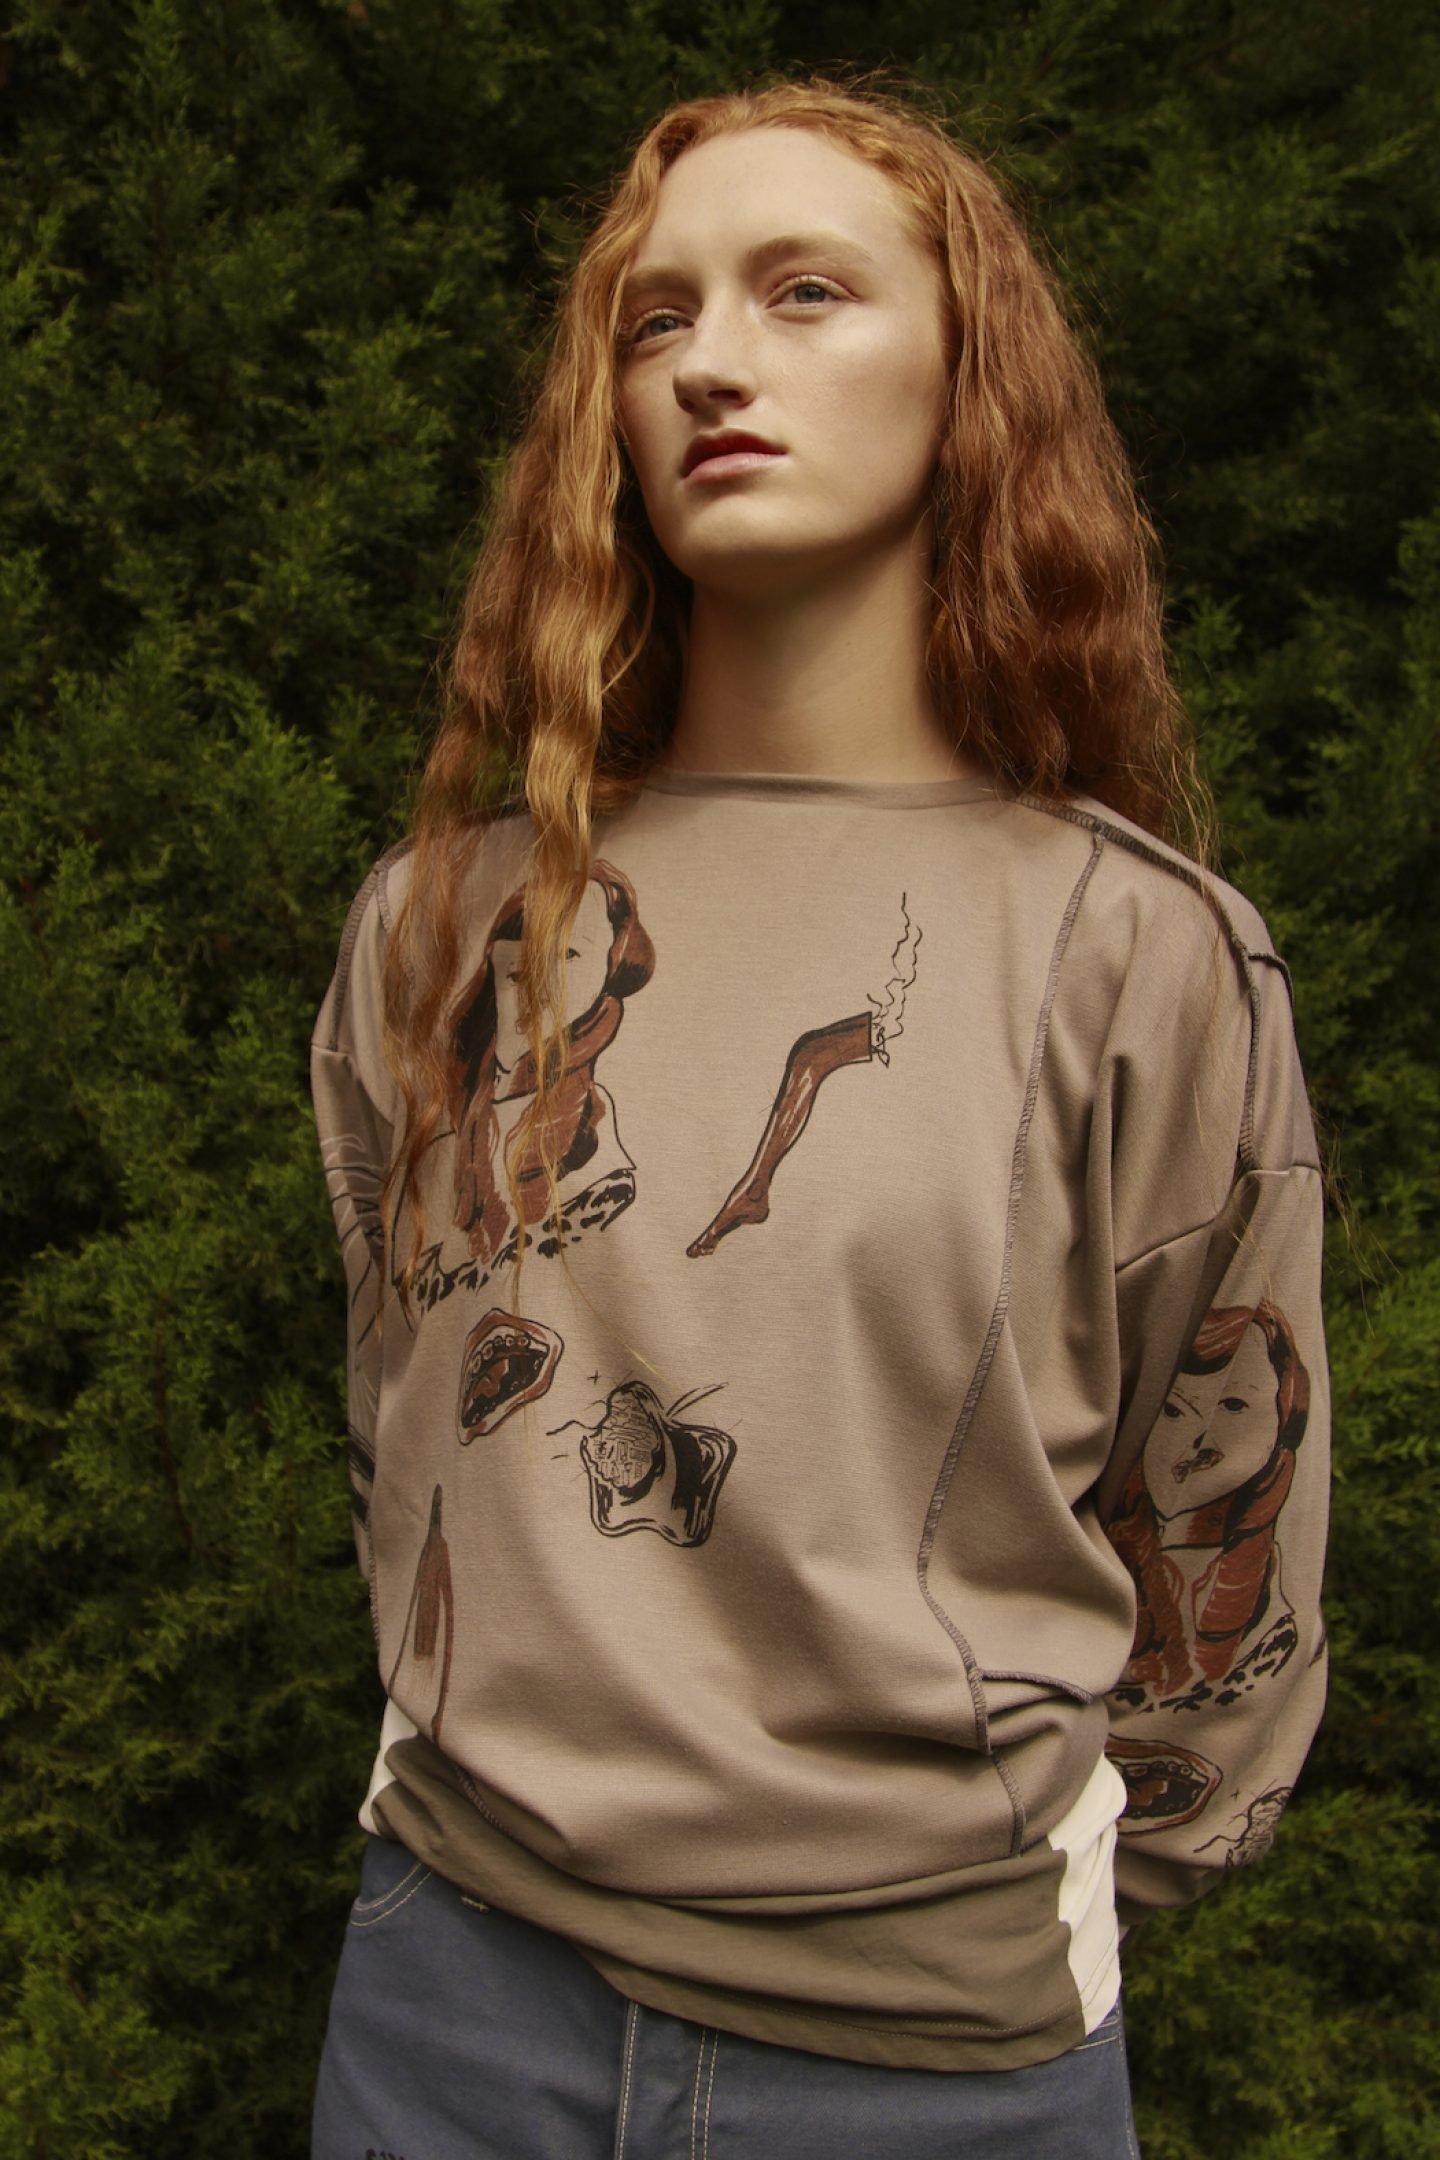 neverland_fashion_001